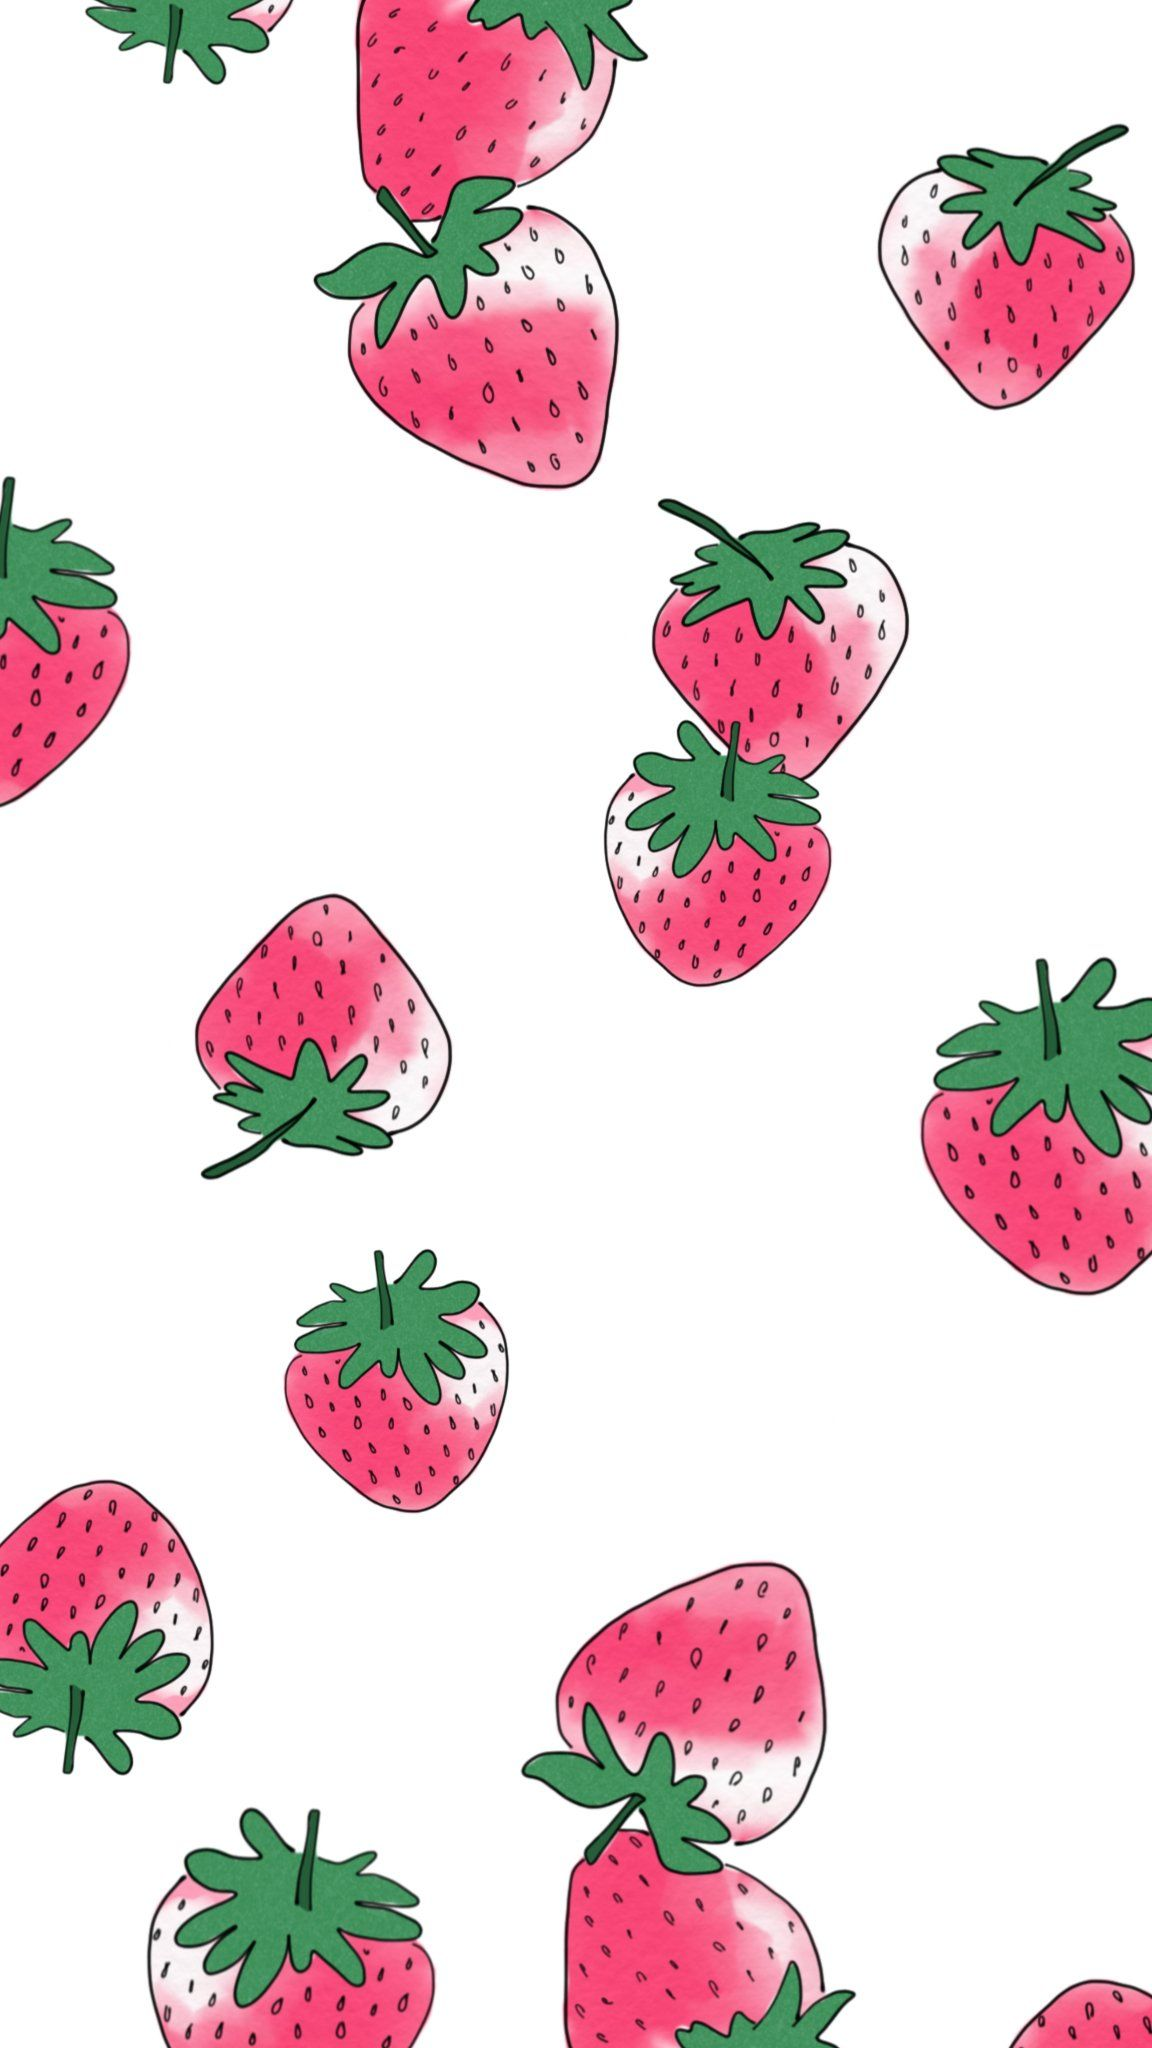 Strawberries Iphone 7 wallpapers, Iphone wallpaper food